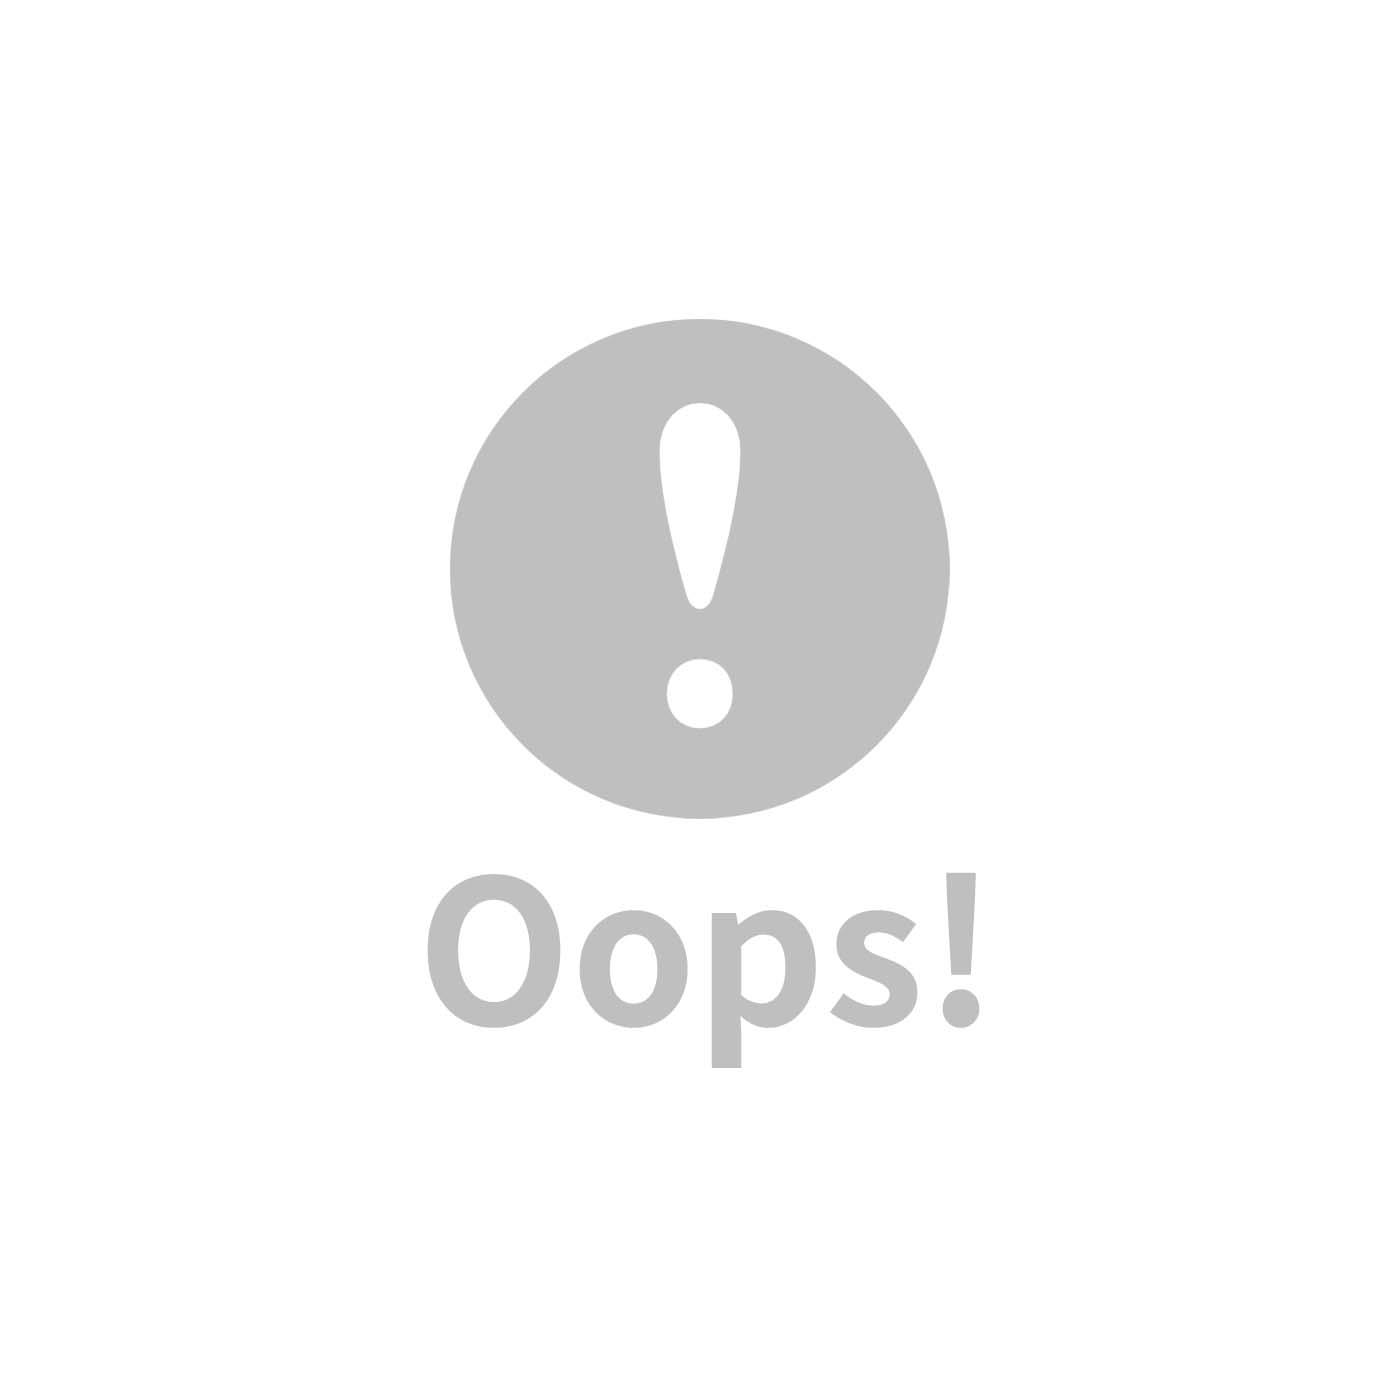 Pacific Baby 美國不鏽鋼保溫太空瓶7oz (親切藍)